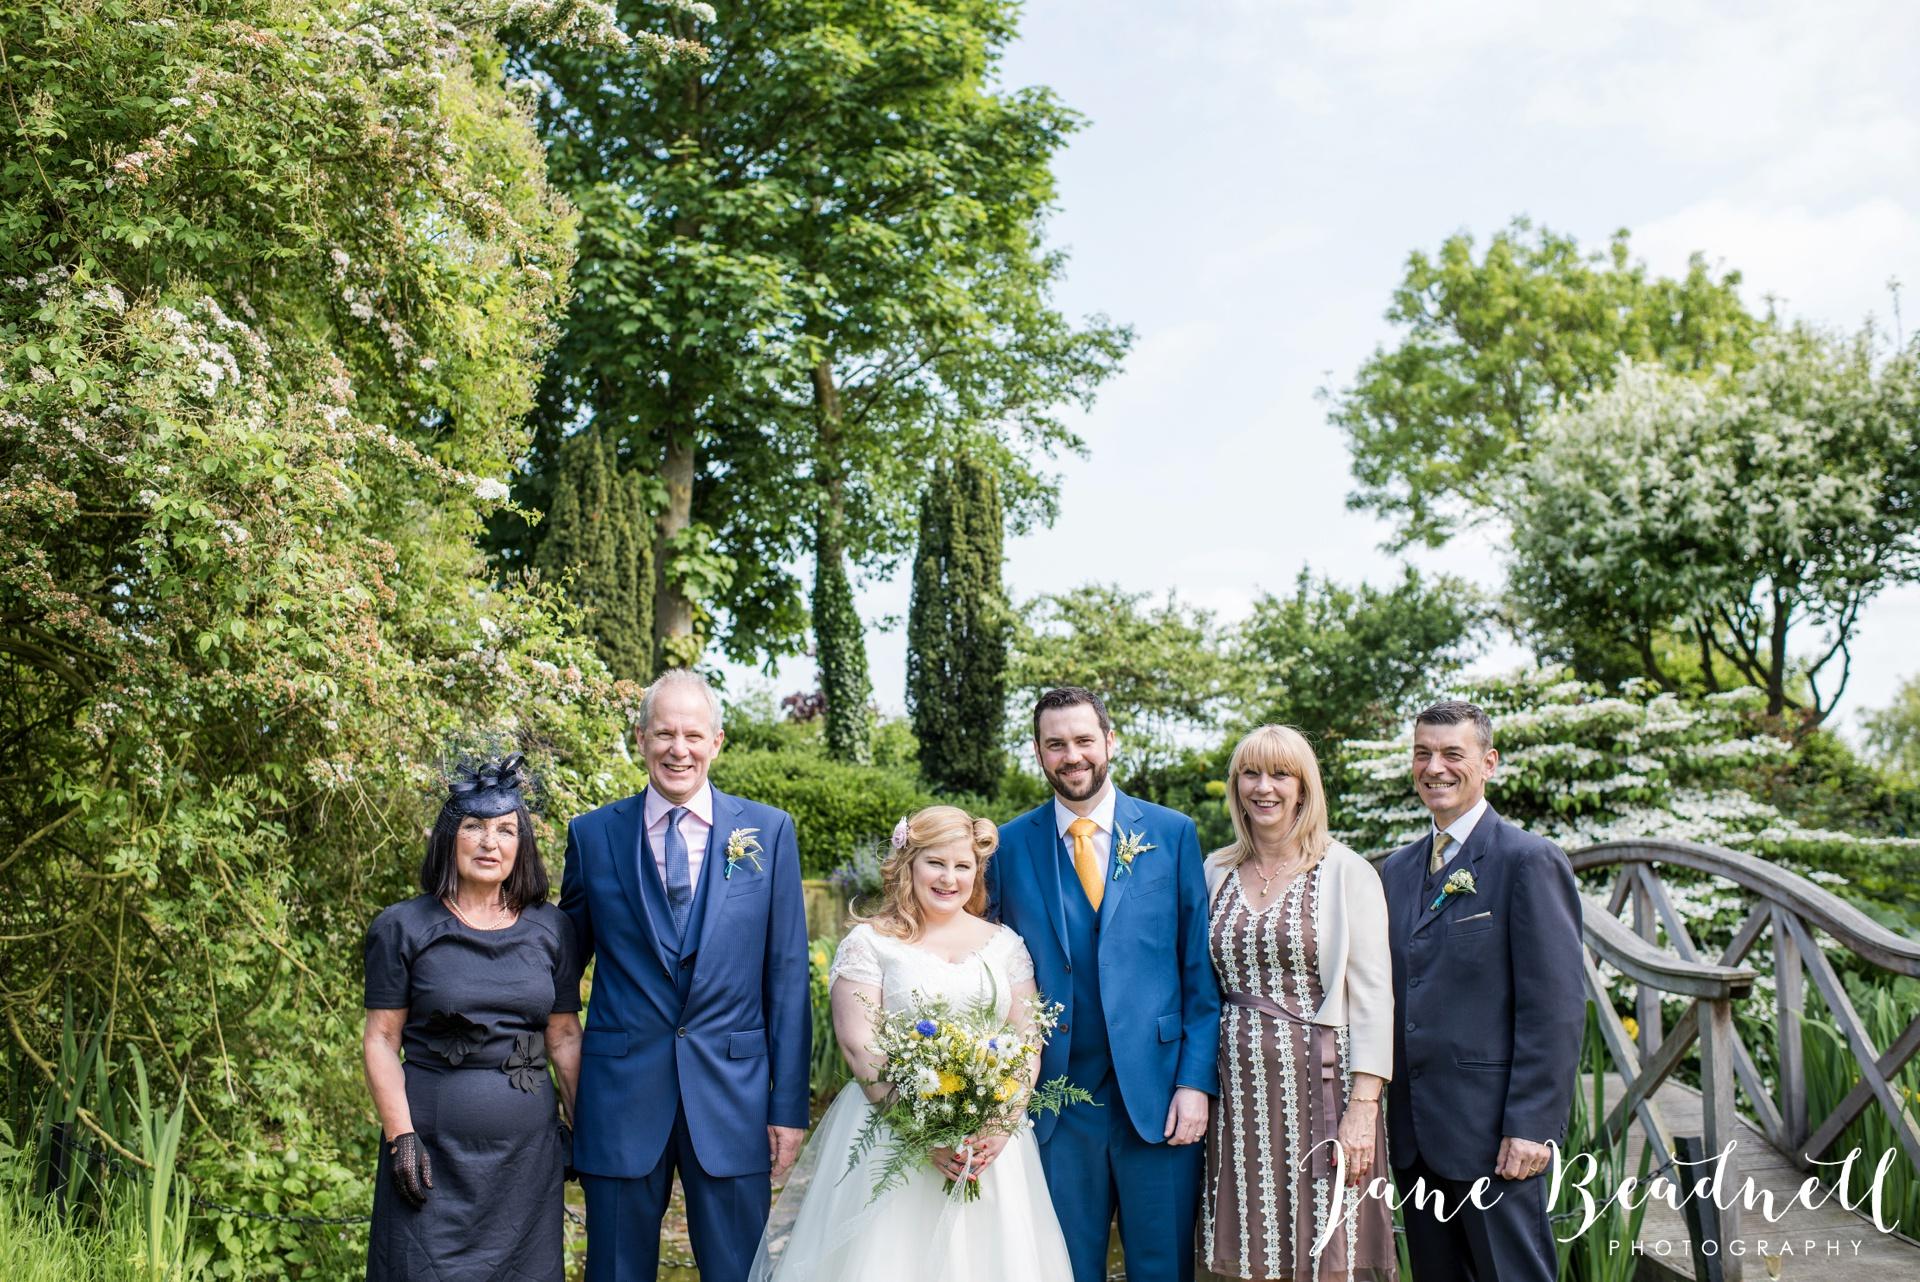 South Farm Wedding photography Hertfordshire by Jane Beadnell Photography fine art wedding photographer_0090